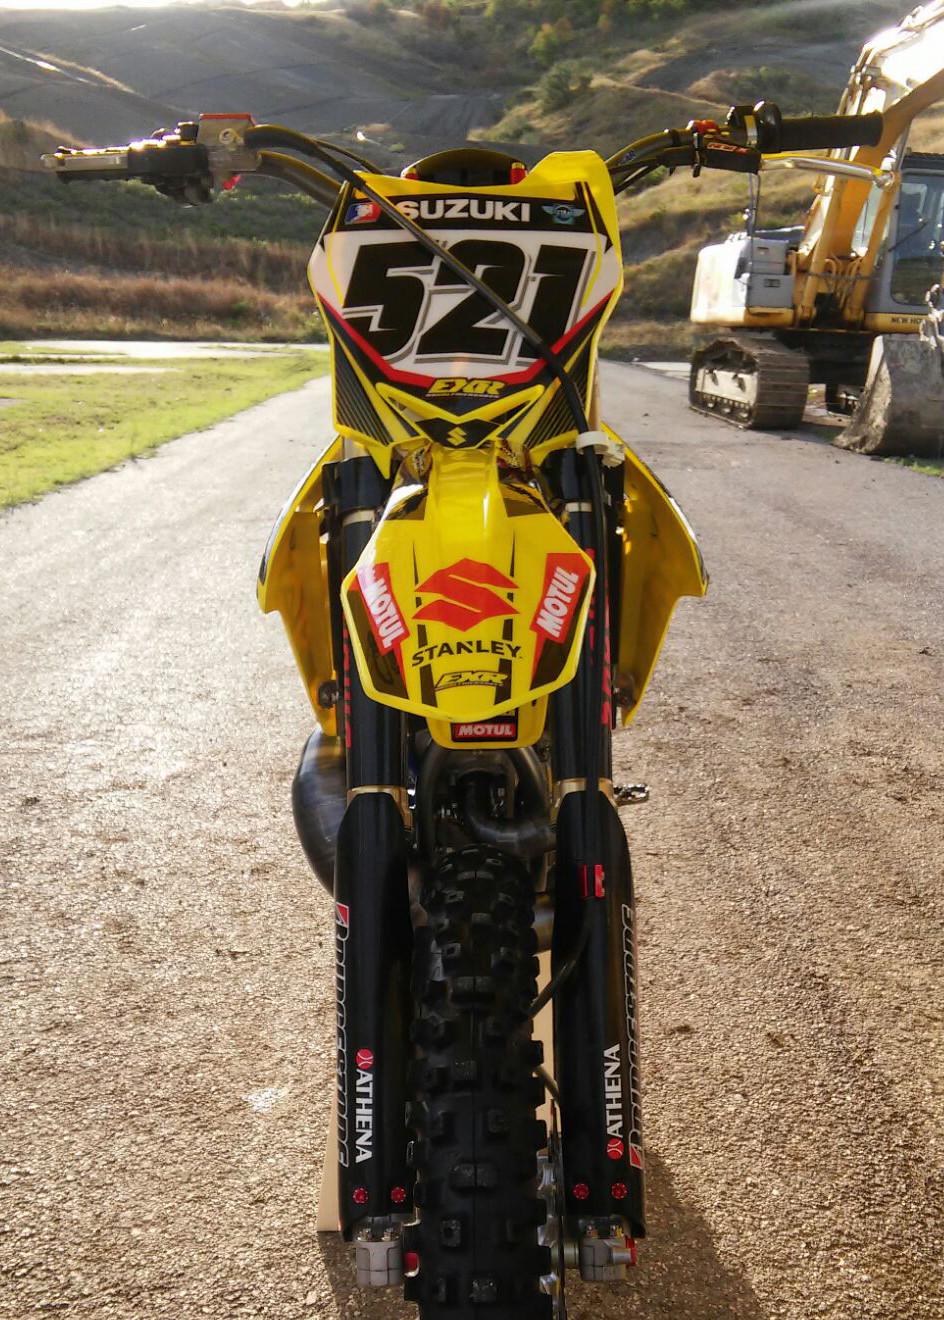 15eebf1af-127f-49aa-bed4-de1c83f626e9 - effettoxtremo - Motocross Pictures - Vital MX